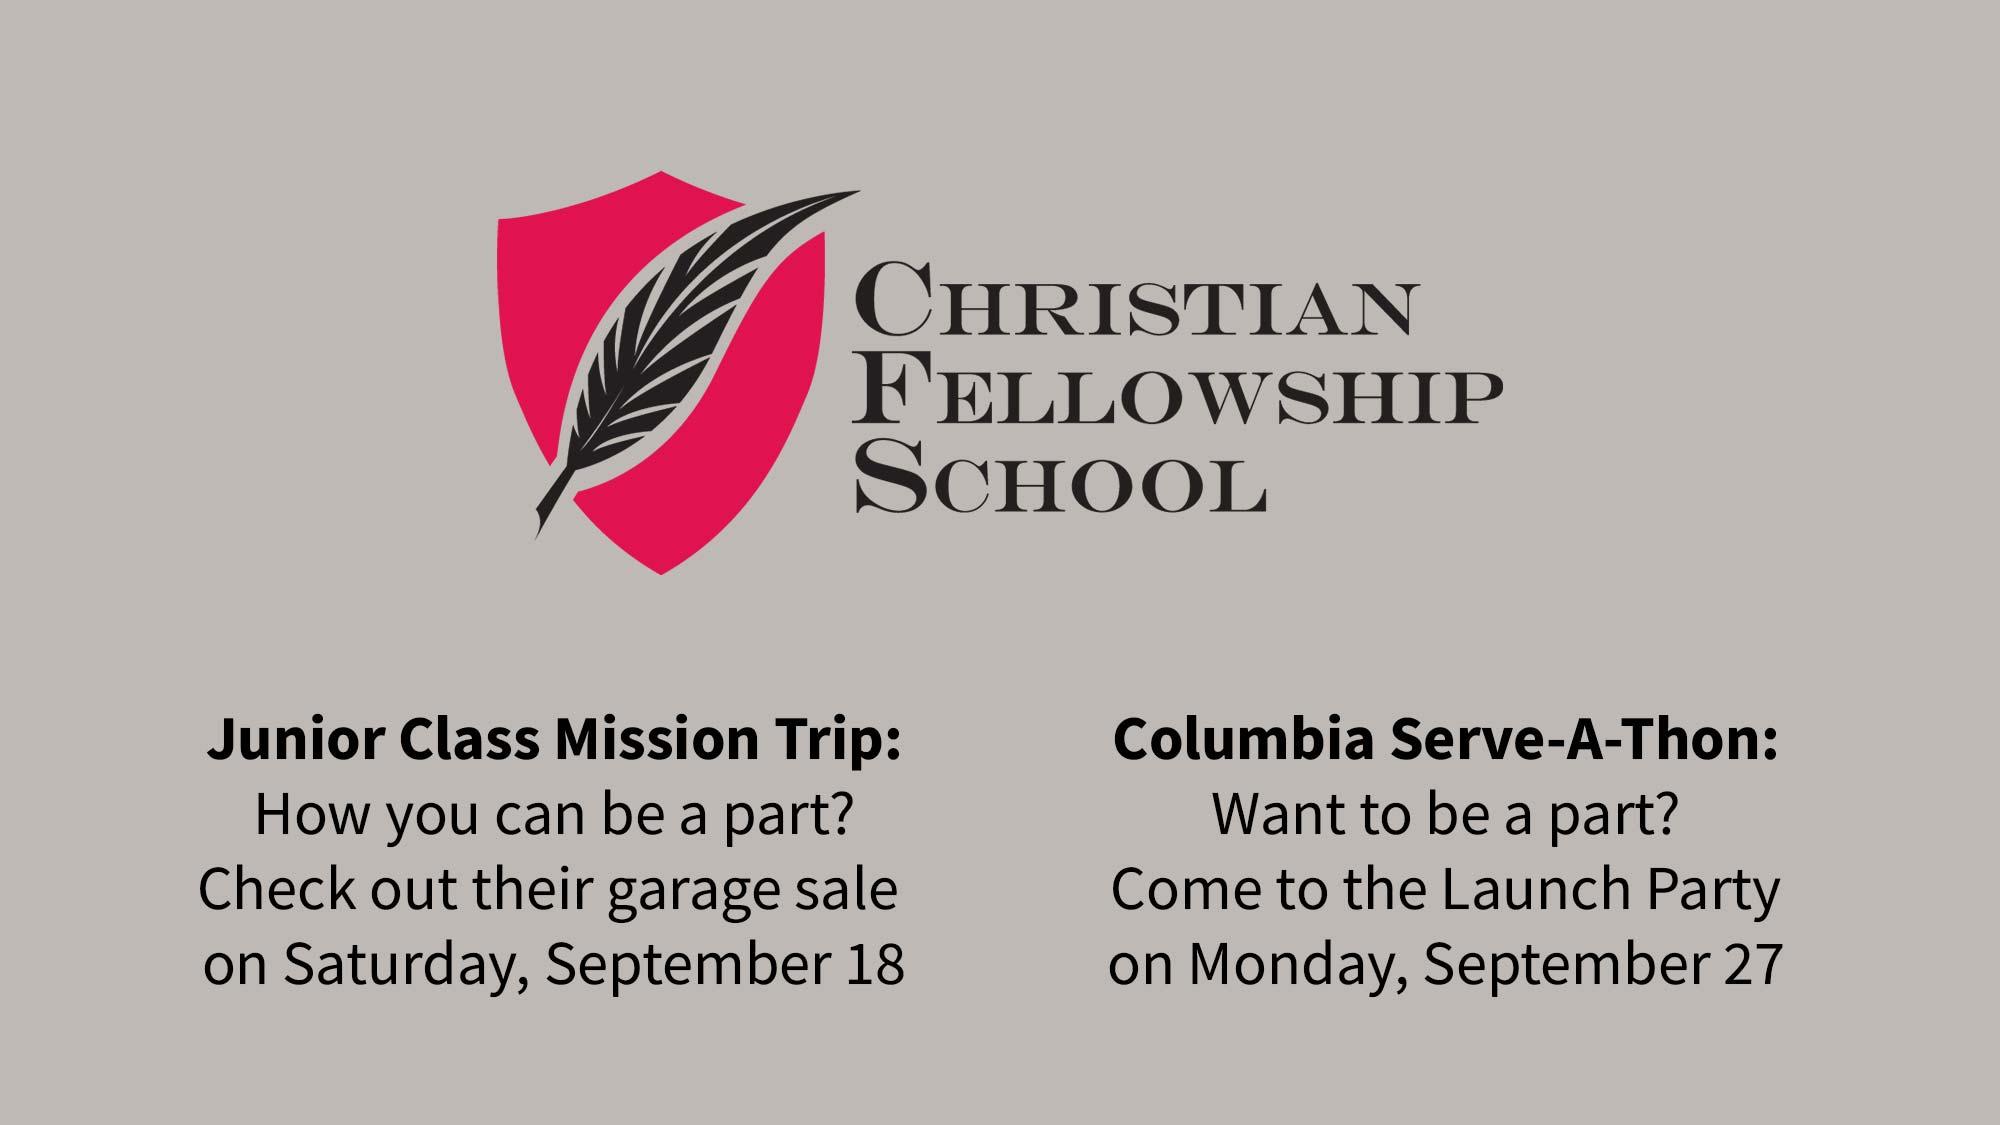 Christian Fellowship School Garage Sale and Serve A Thon